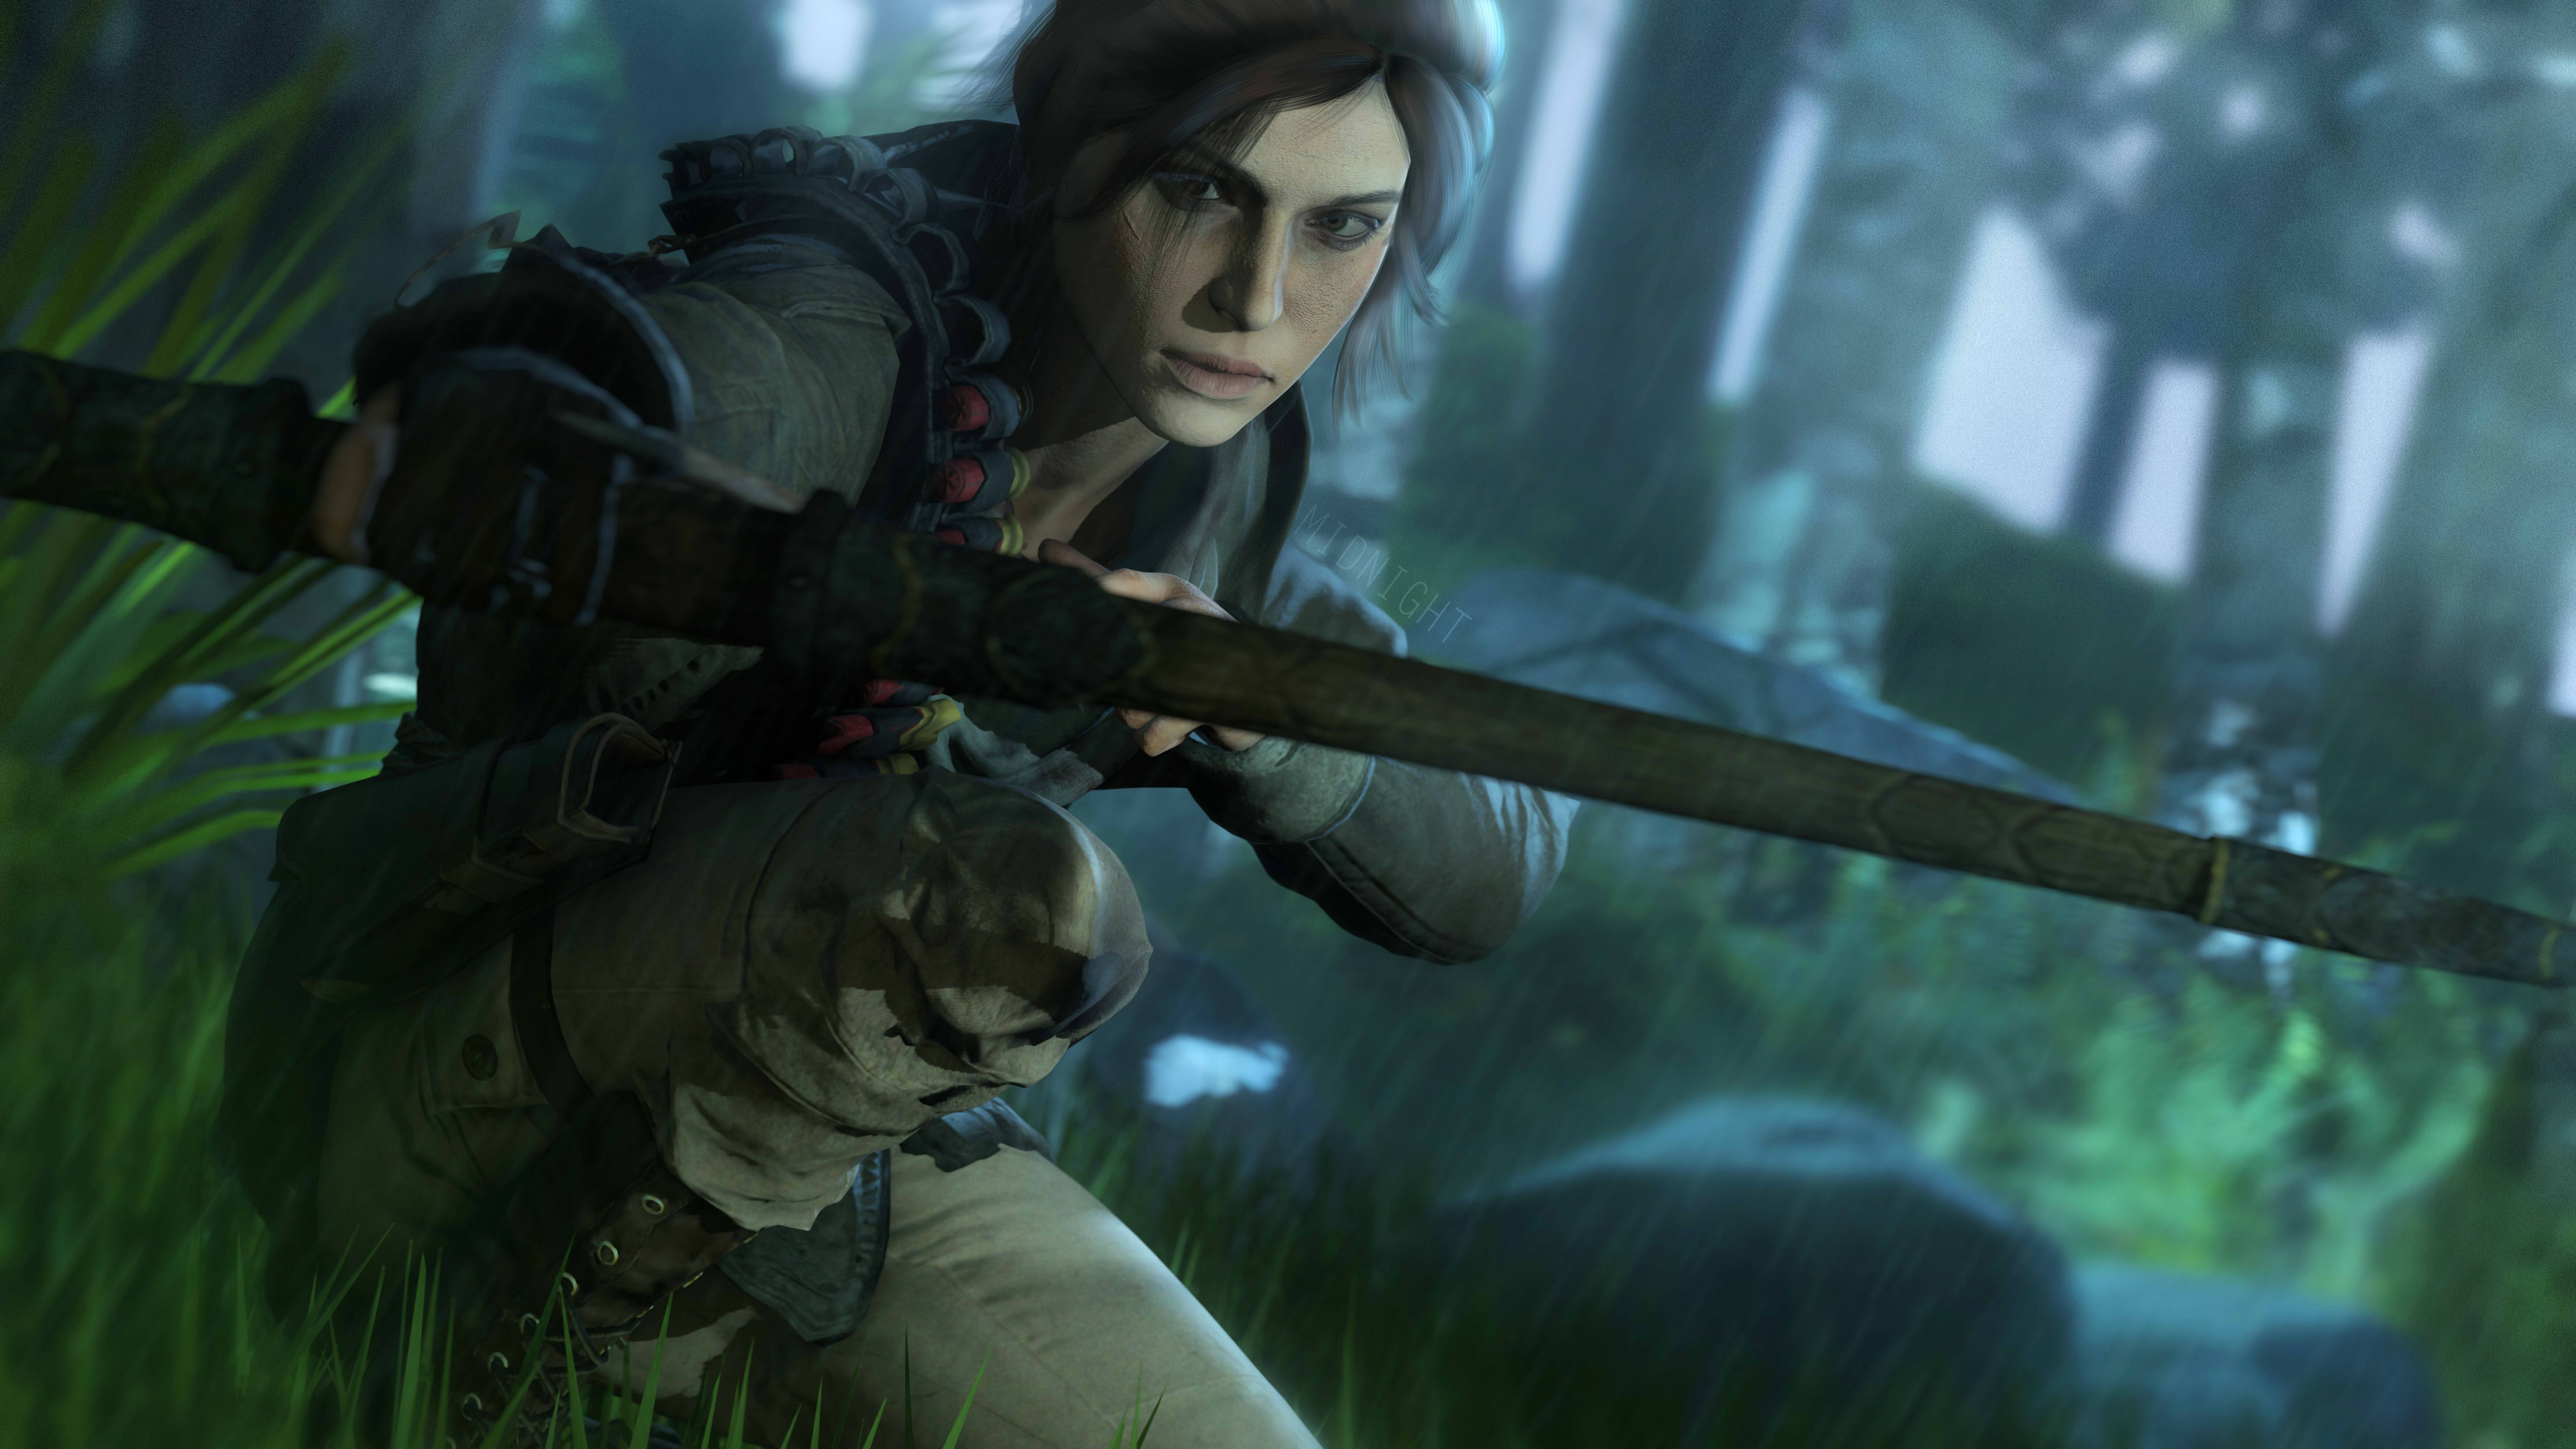 5k Lara Croft Tomb Raider Art, HD Games, 4k Wallpapers